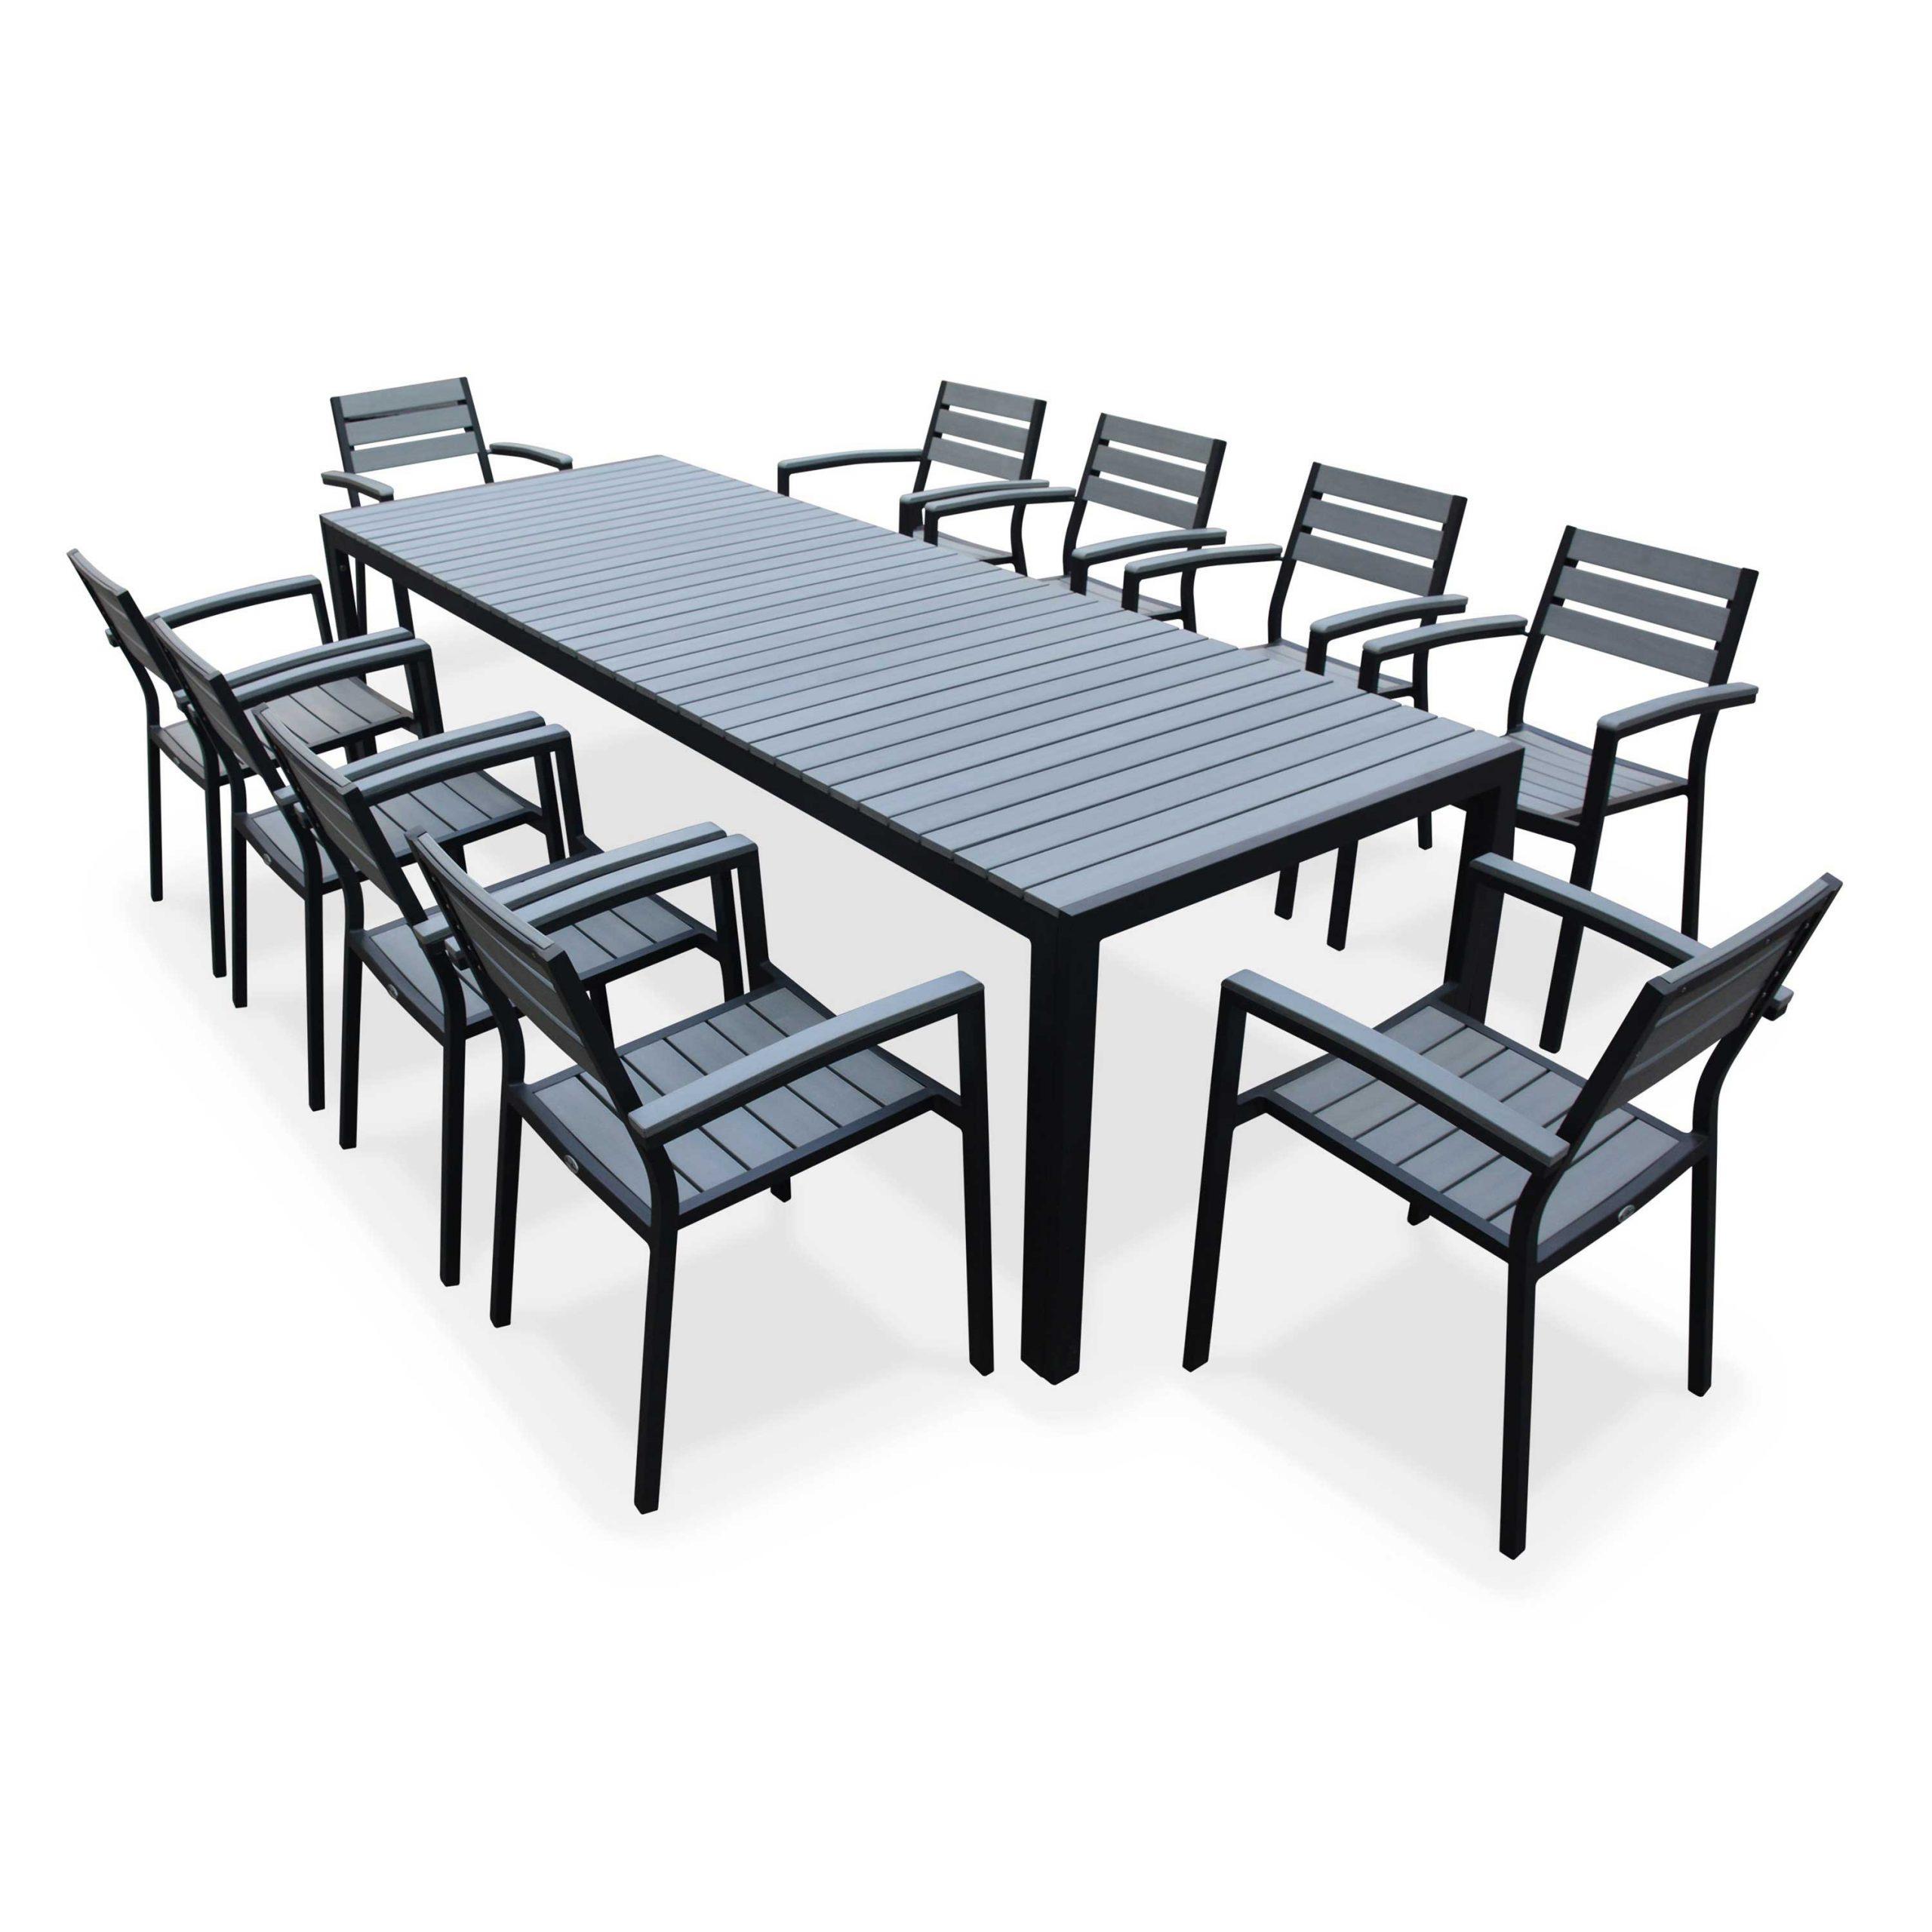 Table De 10 Jardin Personnes Castorama Rocqdxewb concernant Salon De Jardin 10 Personnes